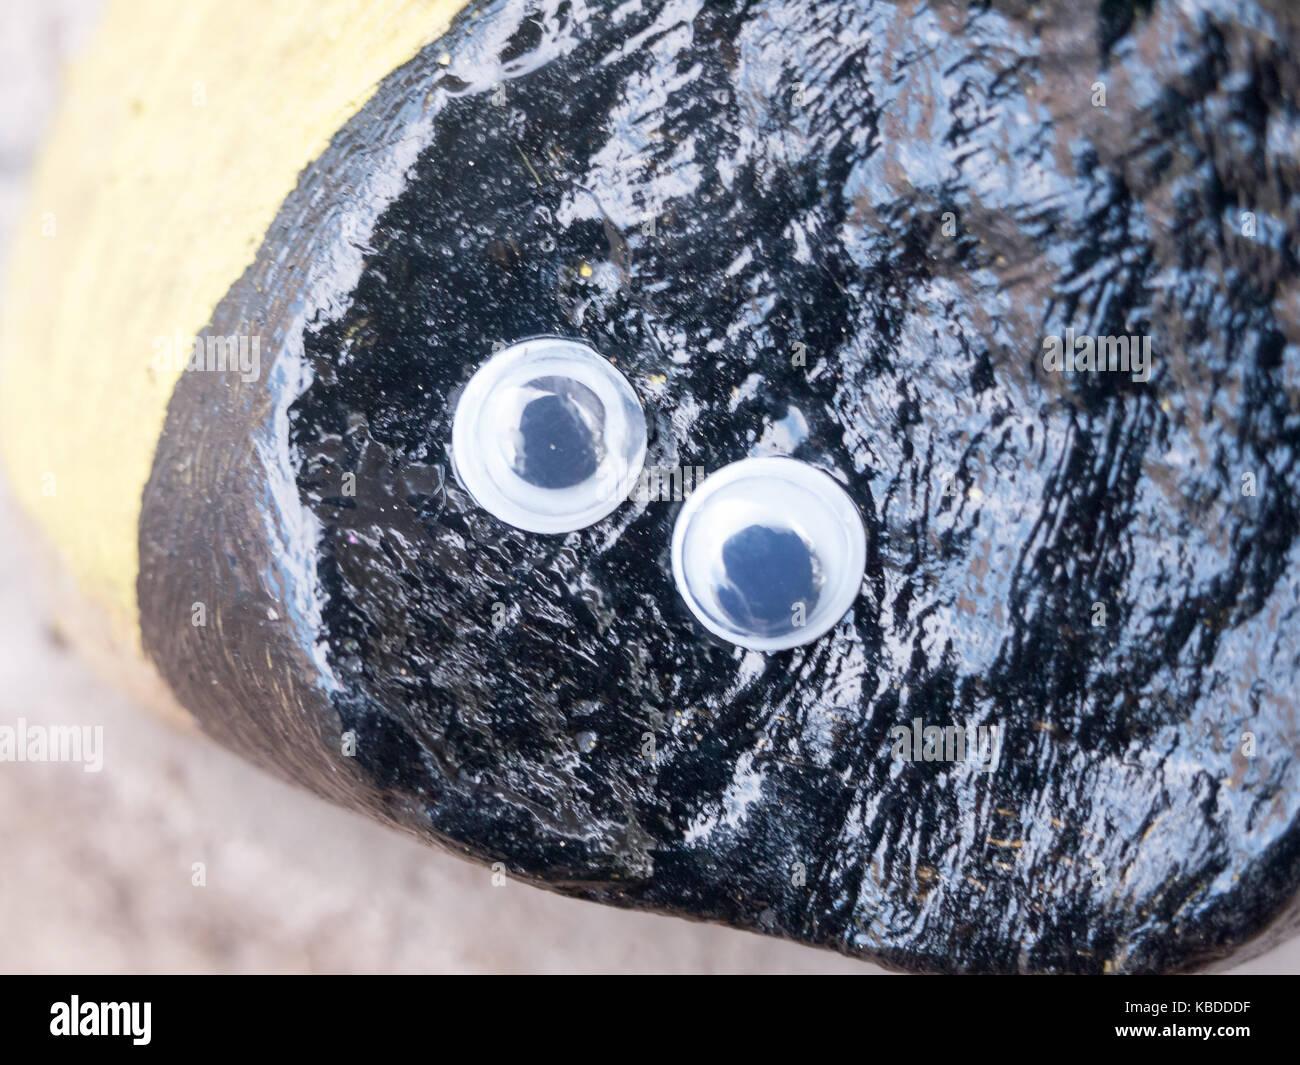 close up of funny cartoon googly eyes on black rock essex england